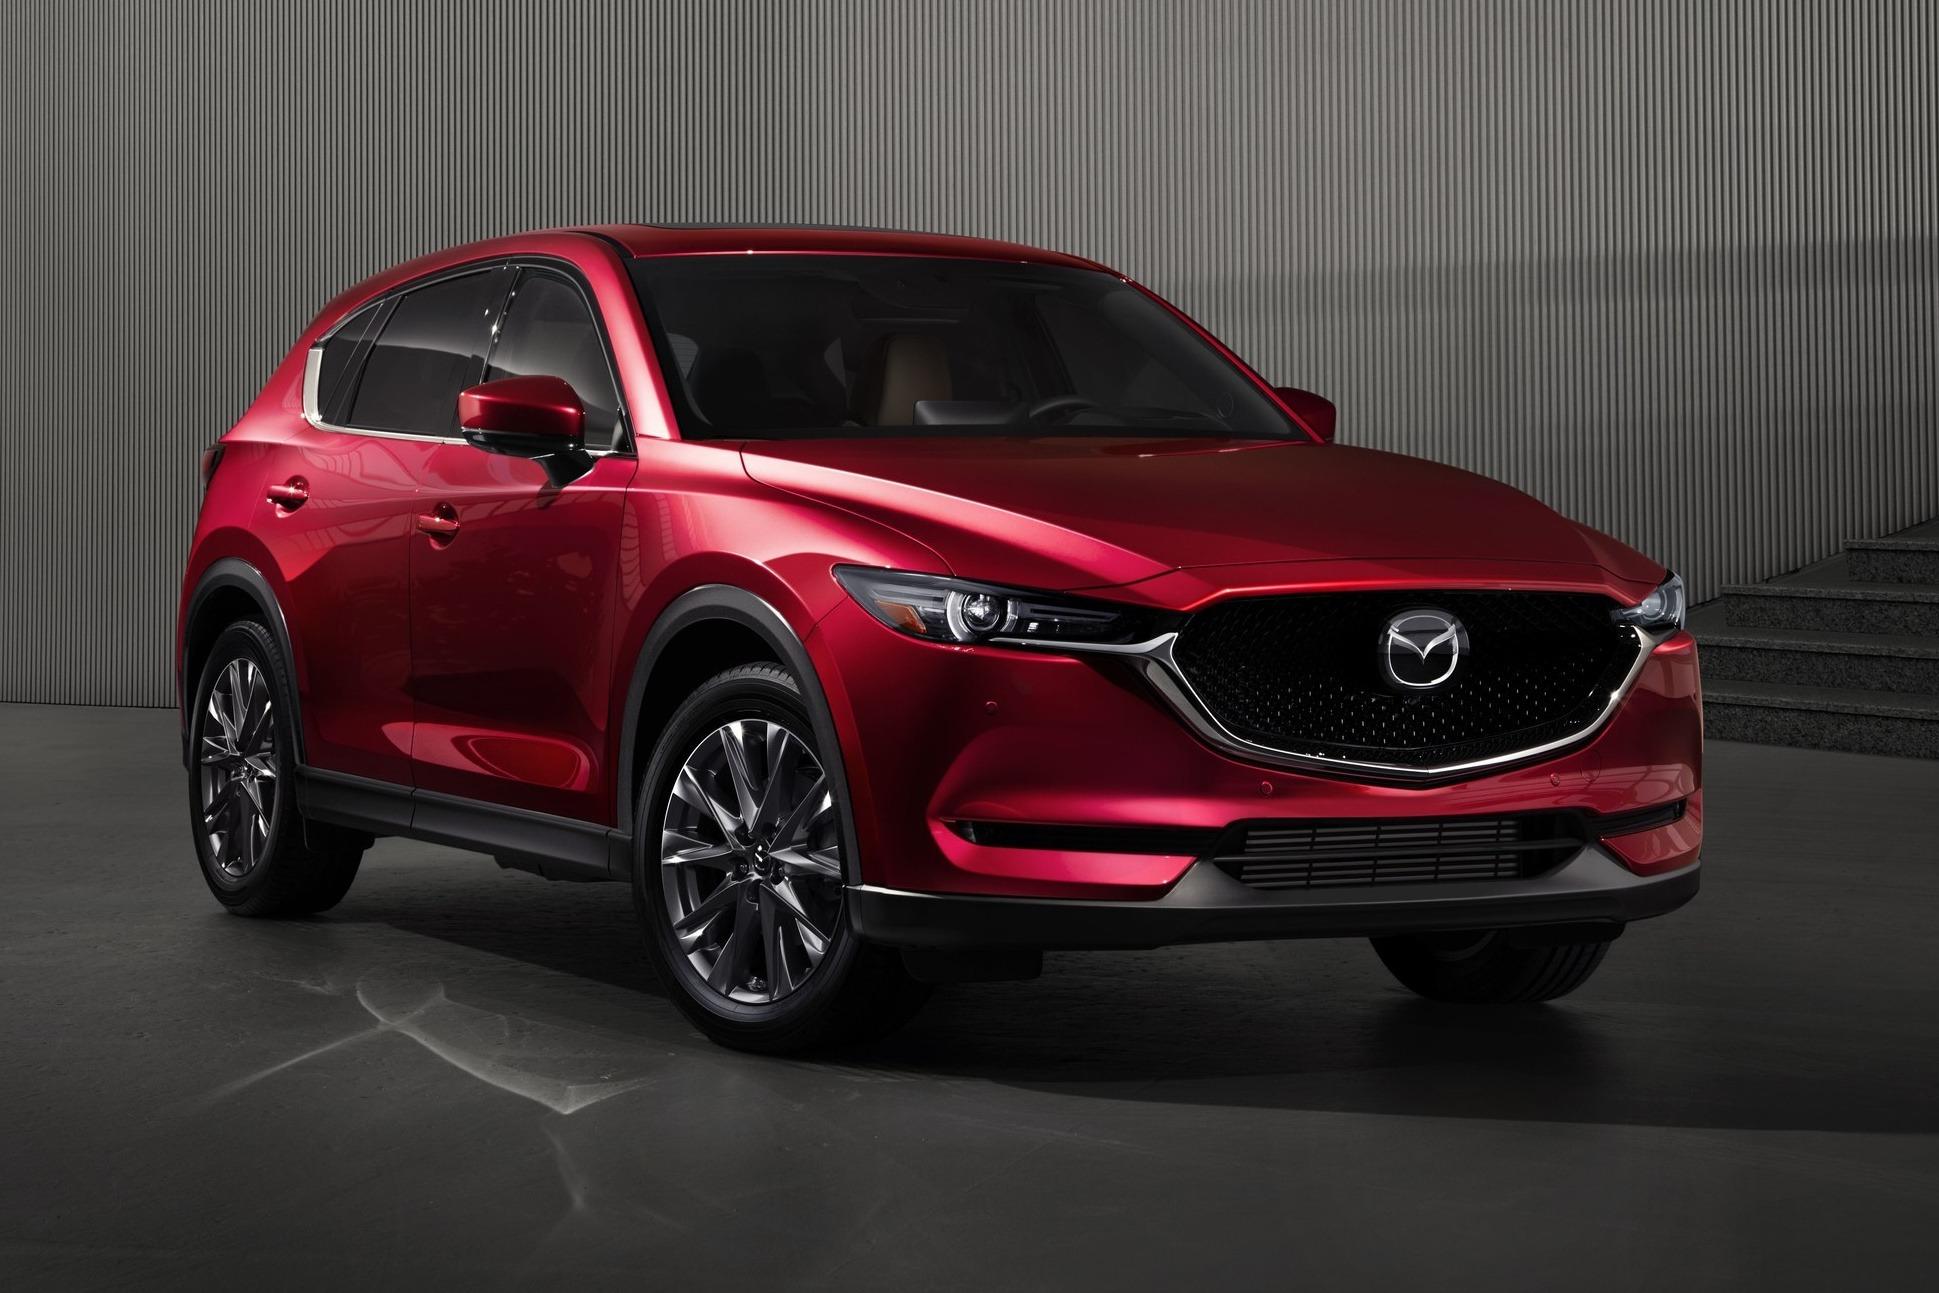 2022 Mazda CX5 Exterior